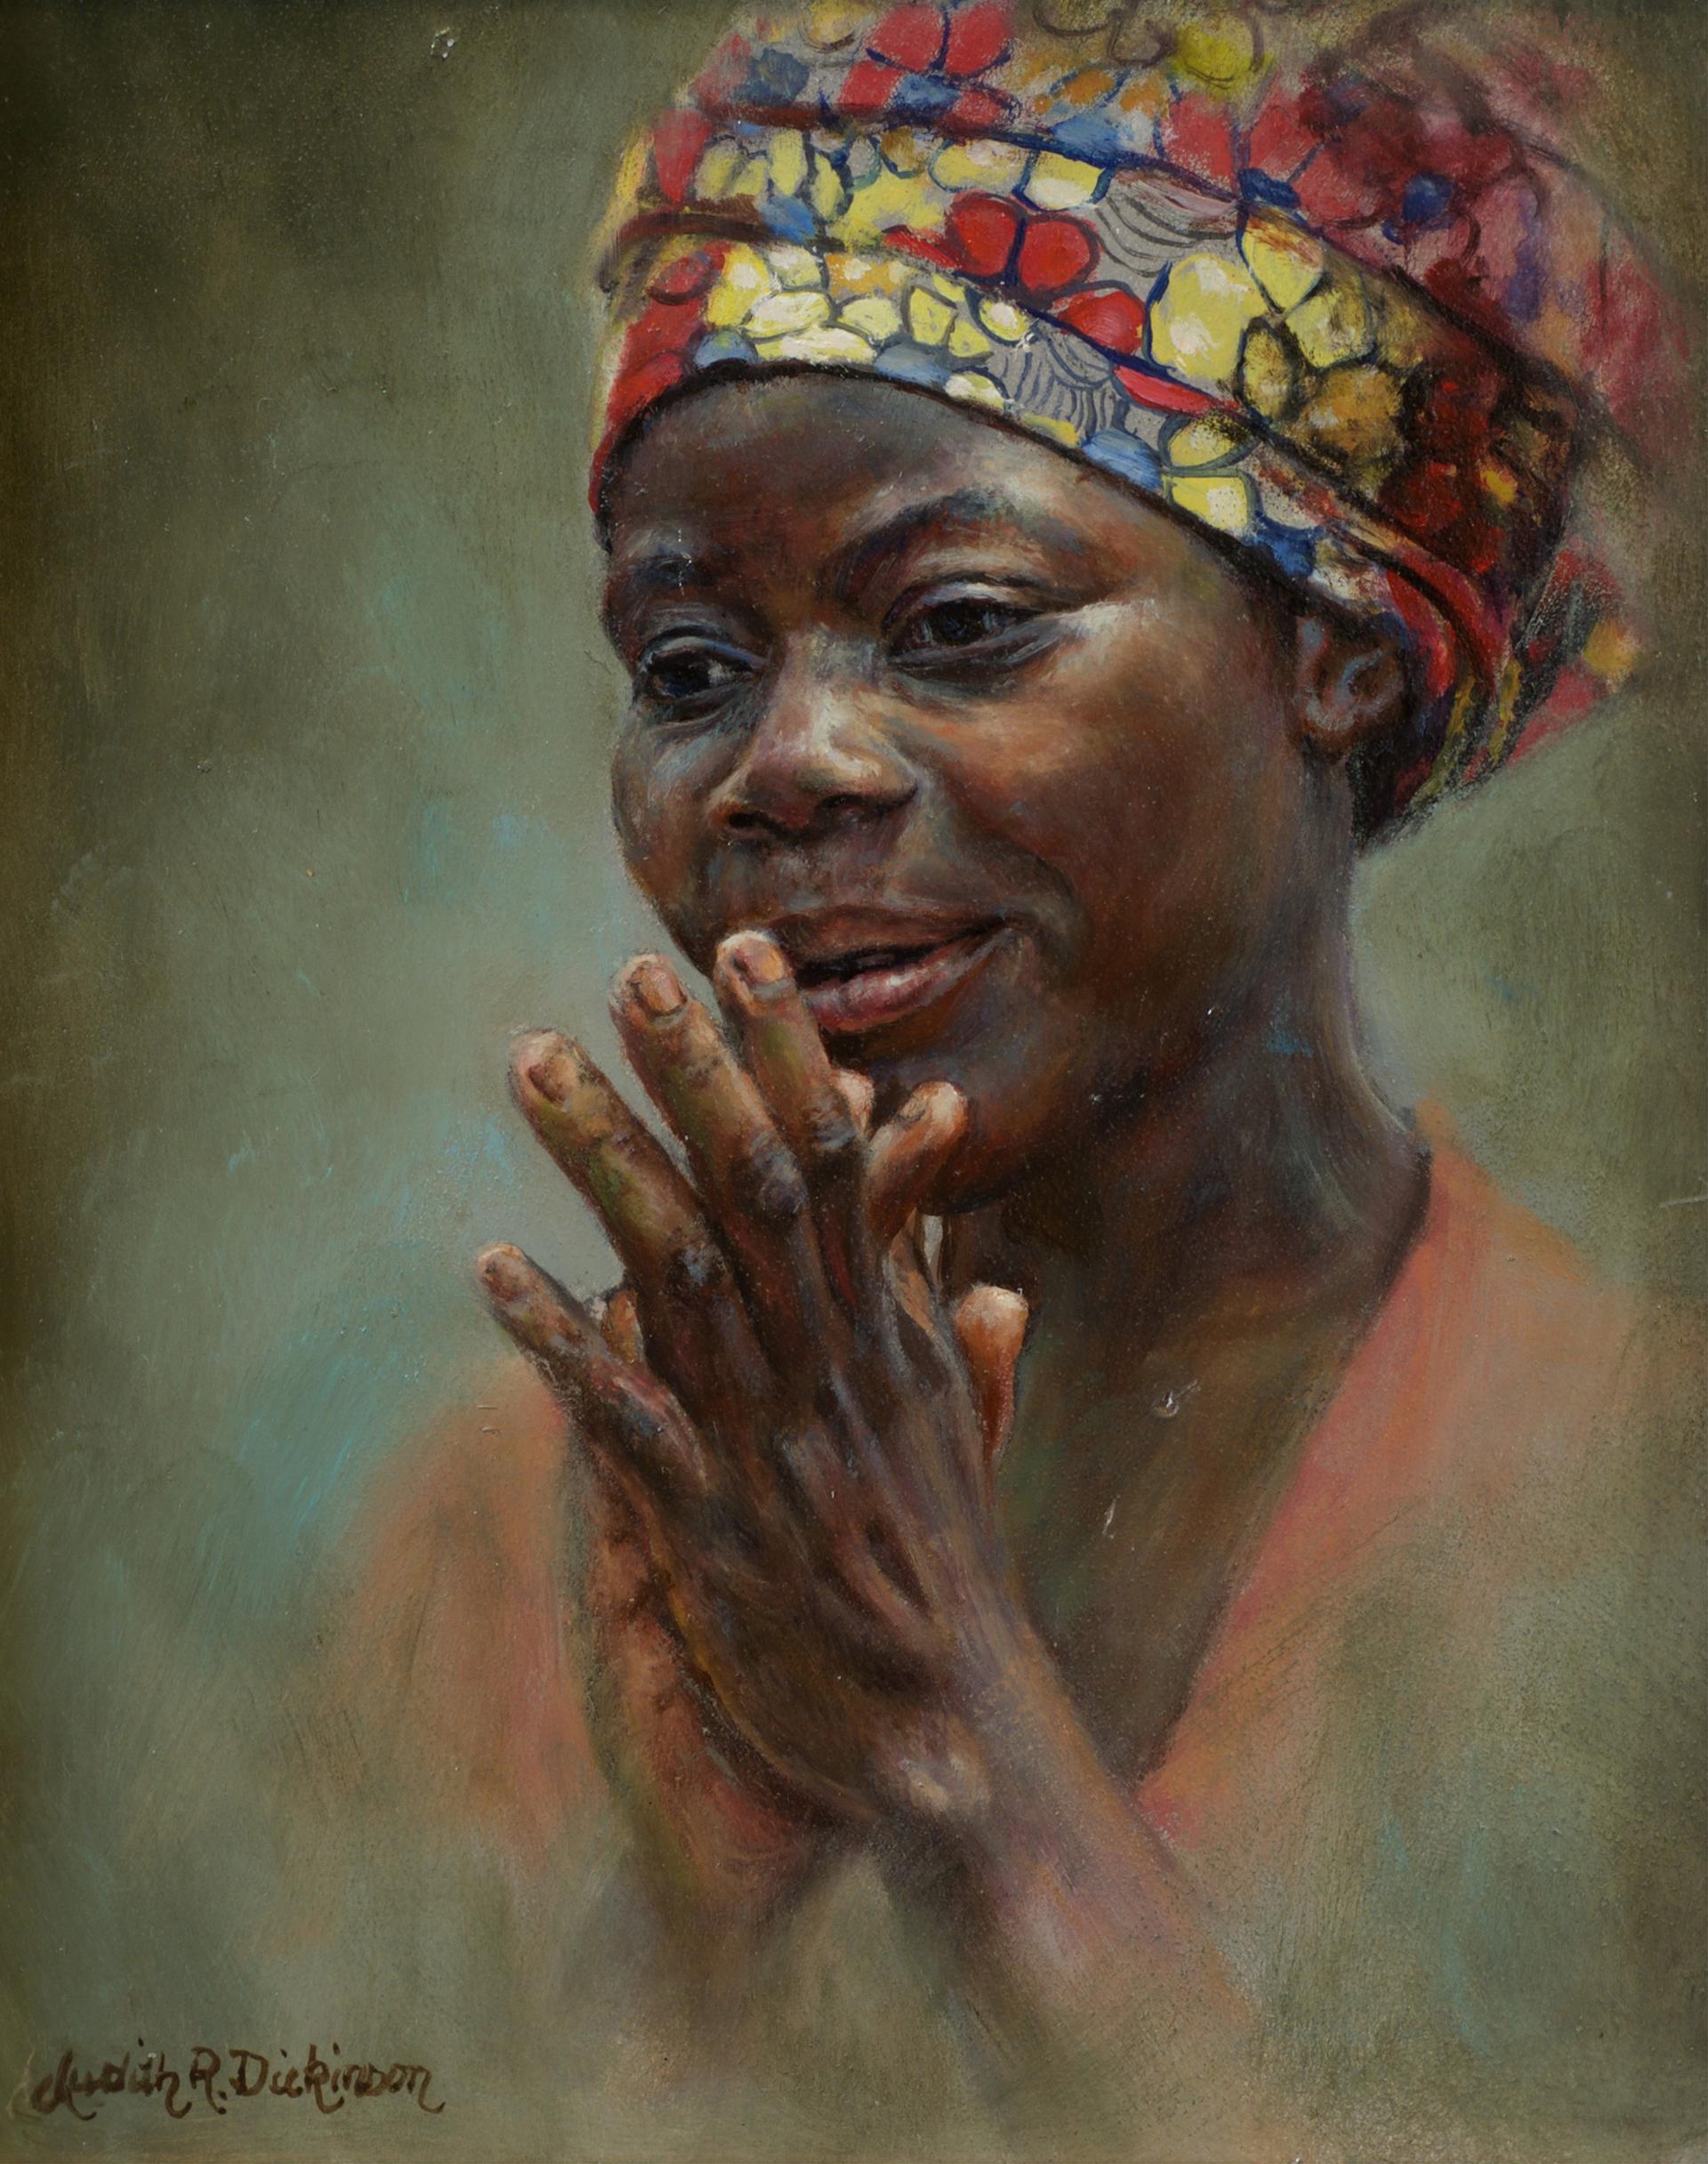 Heart of Joy by Judith Dickinson